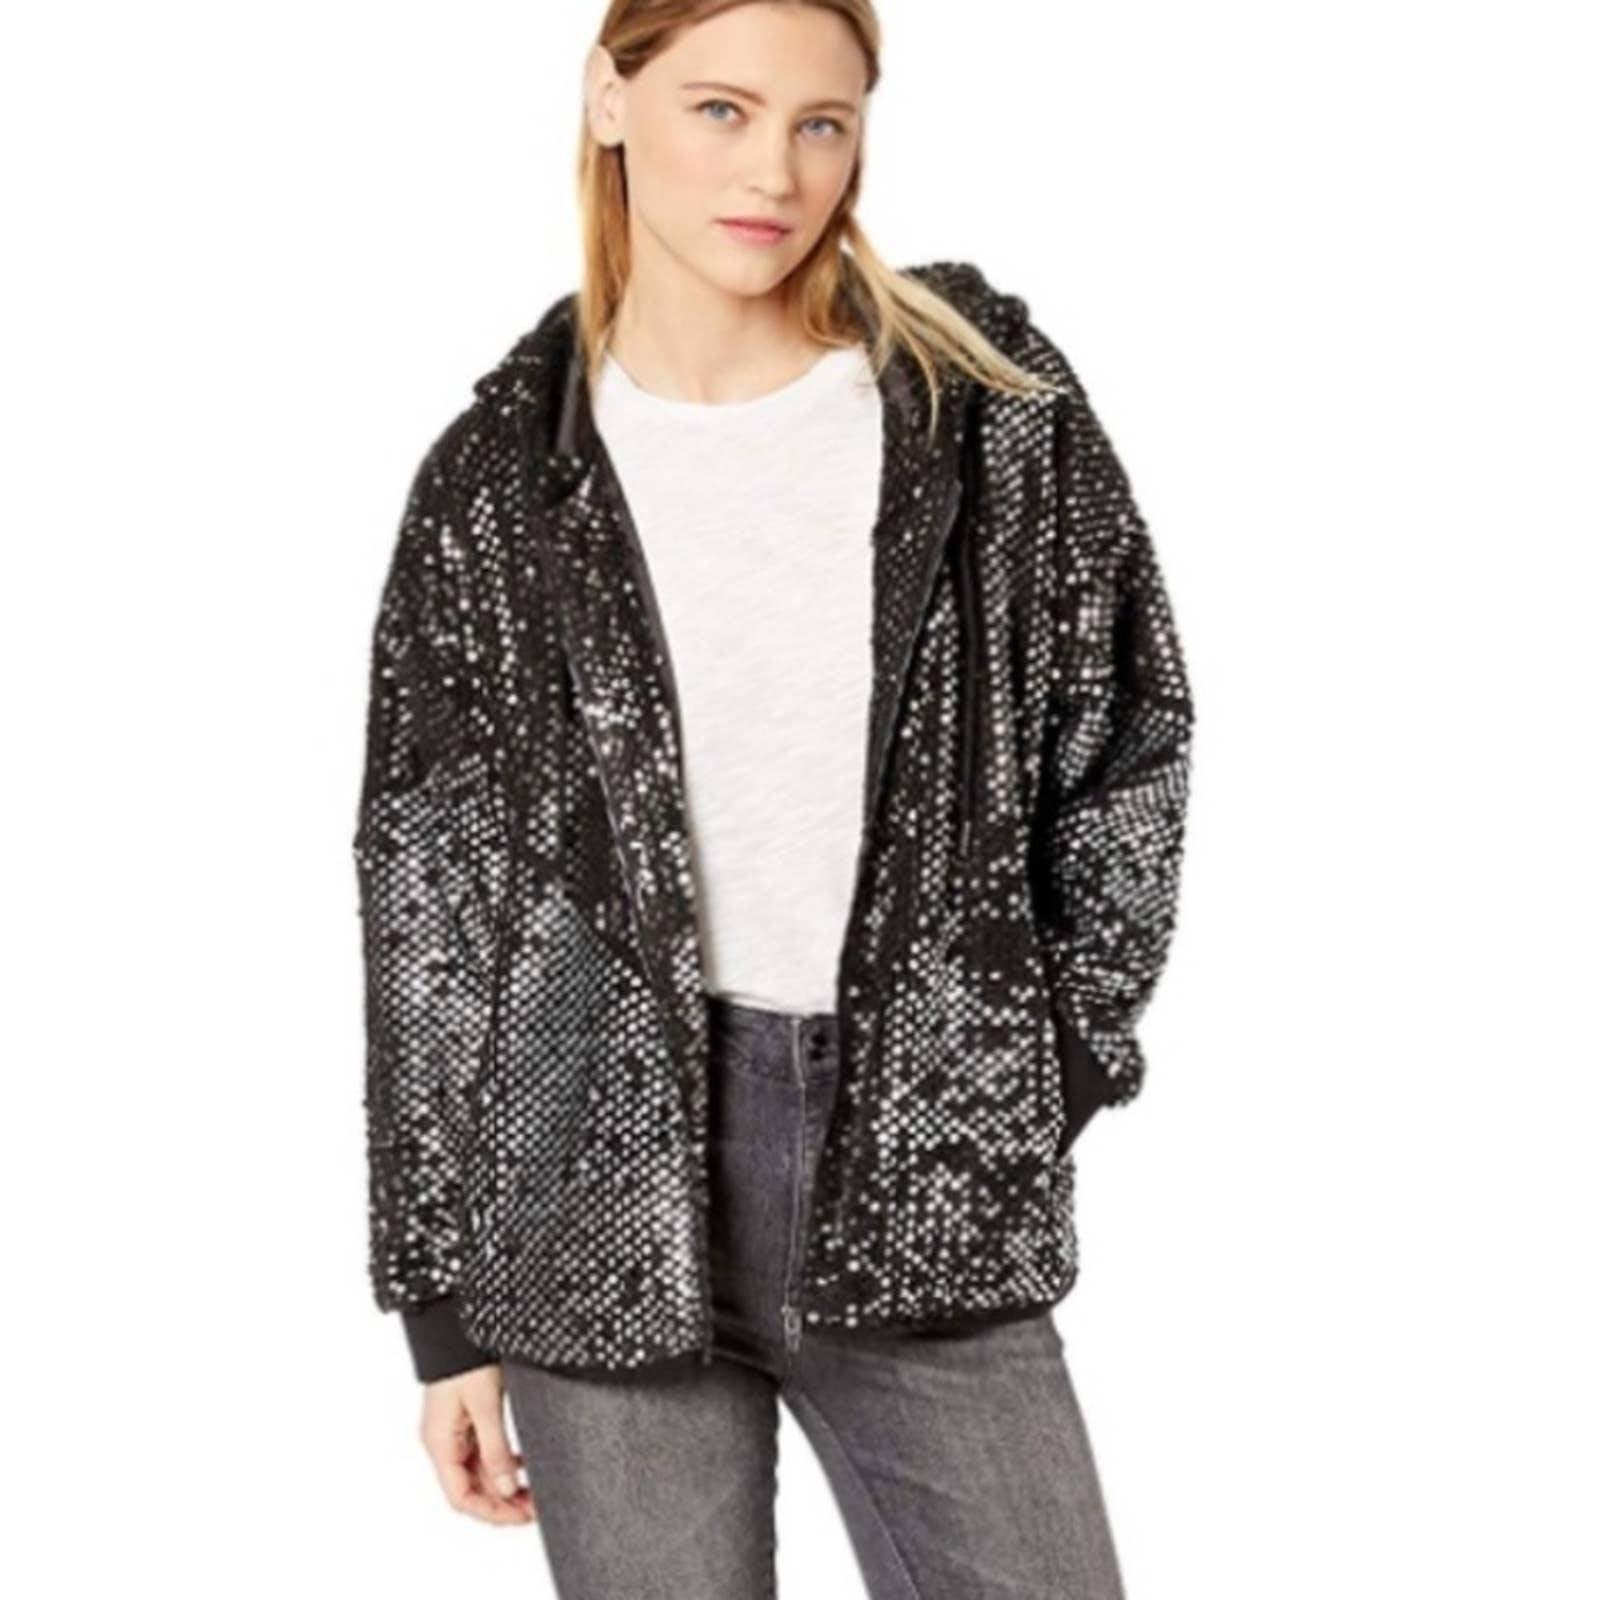 NWT BLANKNYC Black Sequin Lights Jacket